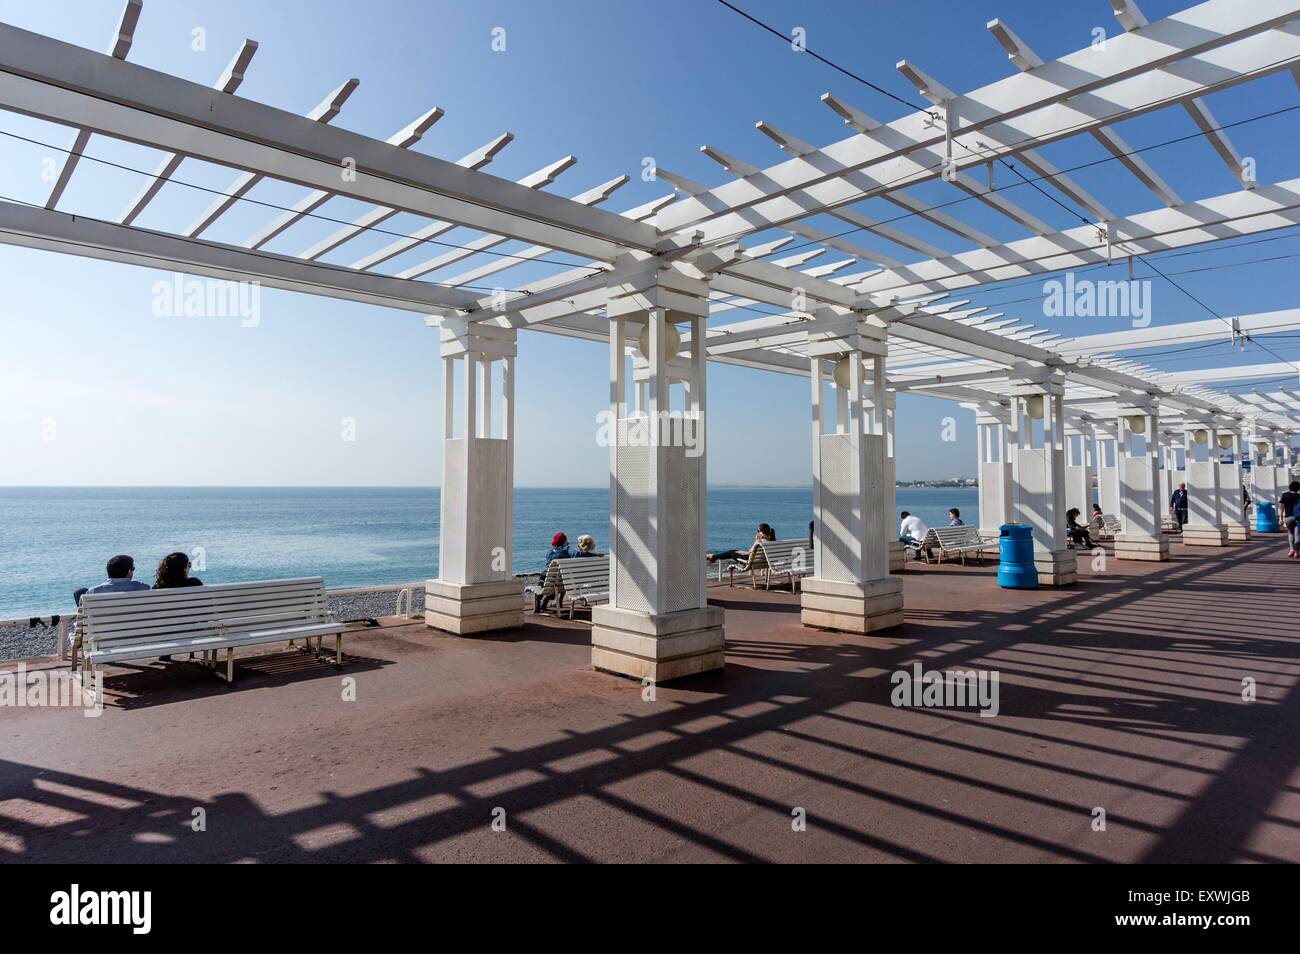 Promenade des Anglais, Nice, France - Stock Image